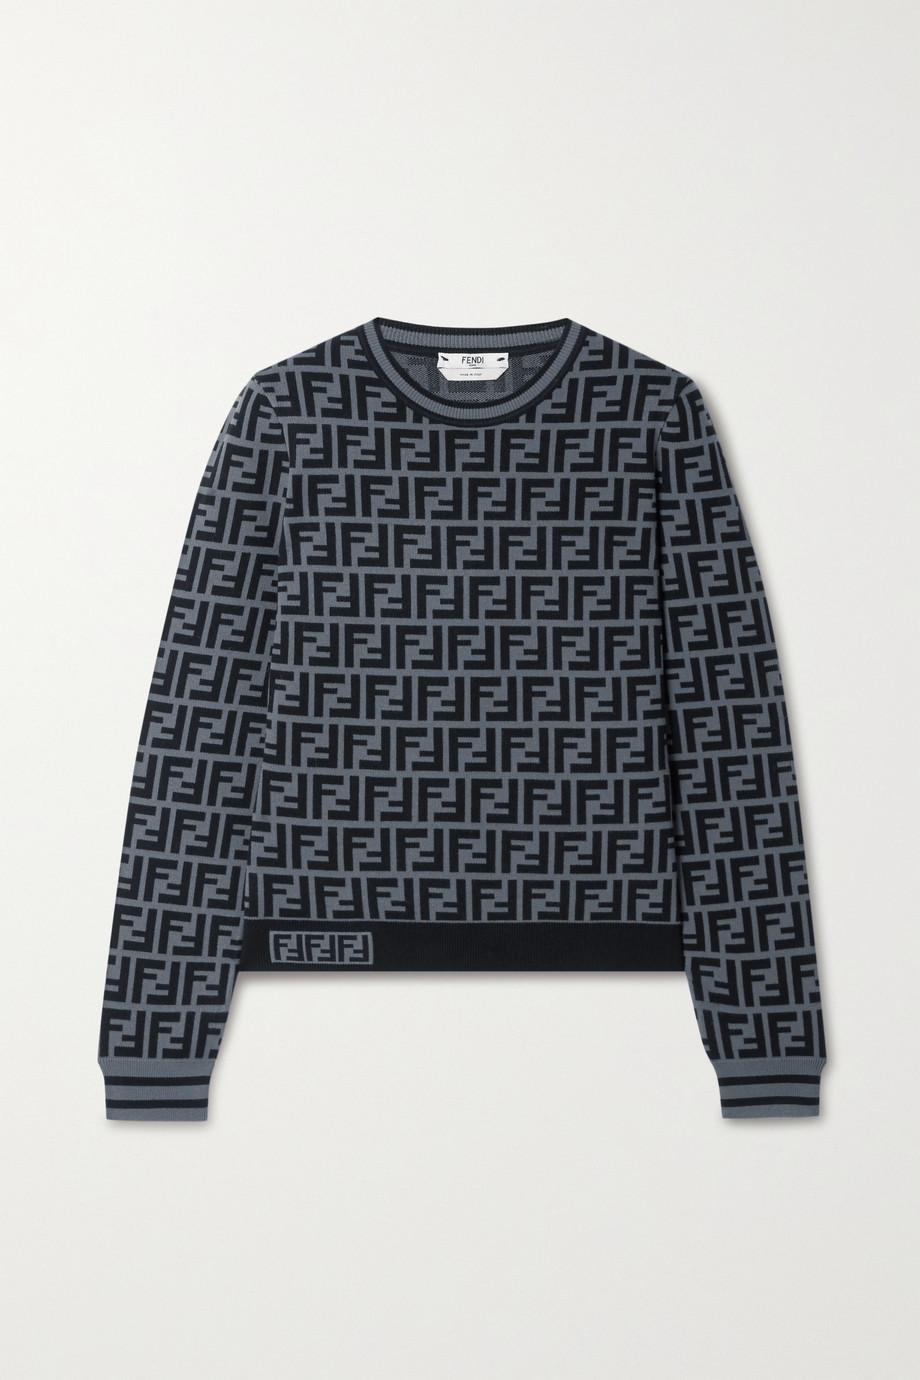 Fendi Jacquard-knit sweater